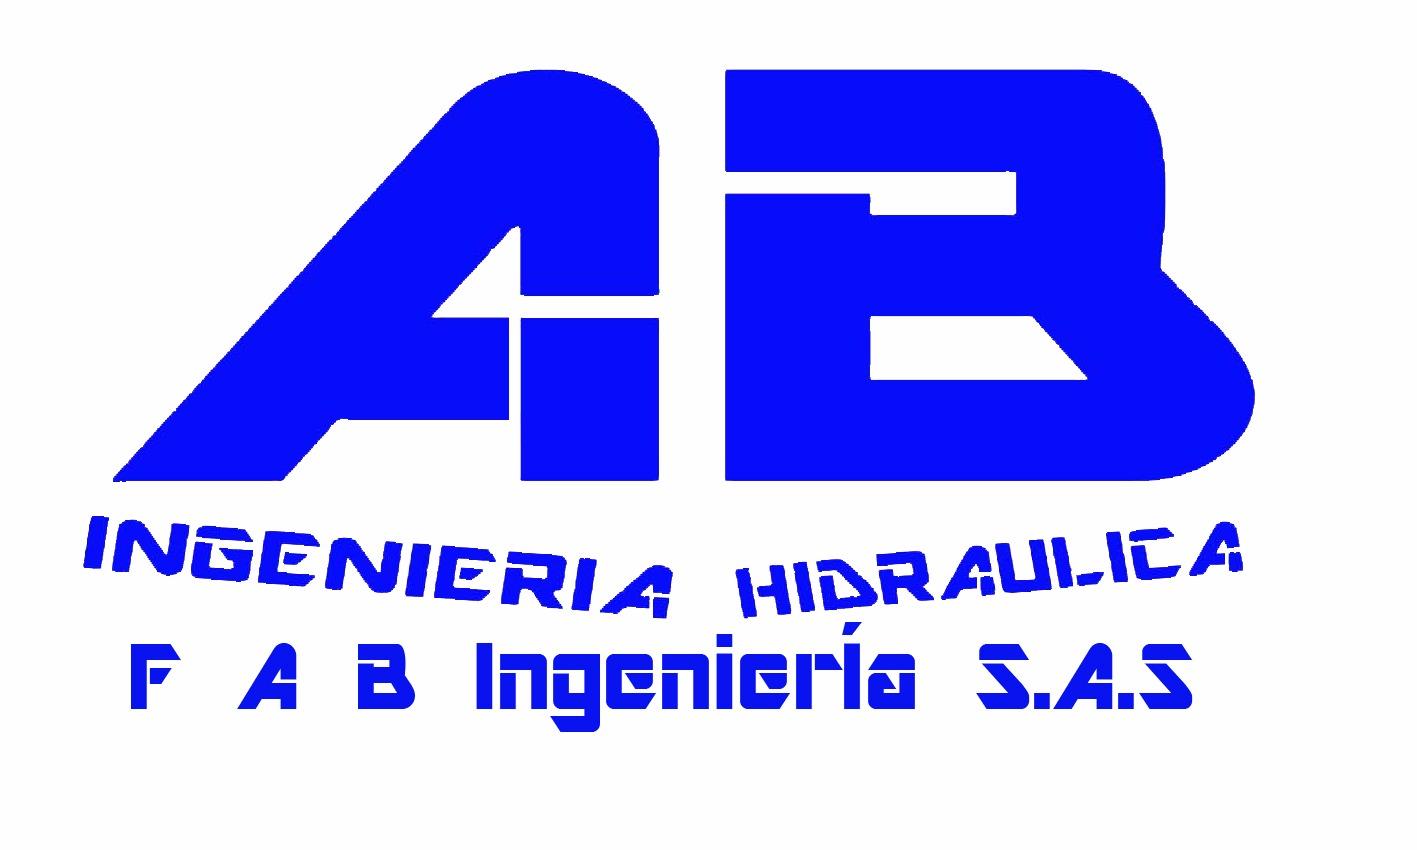 F A B Ingenieria